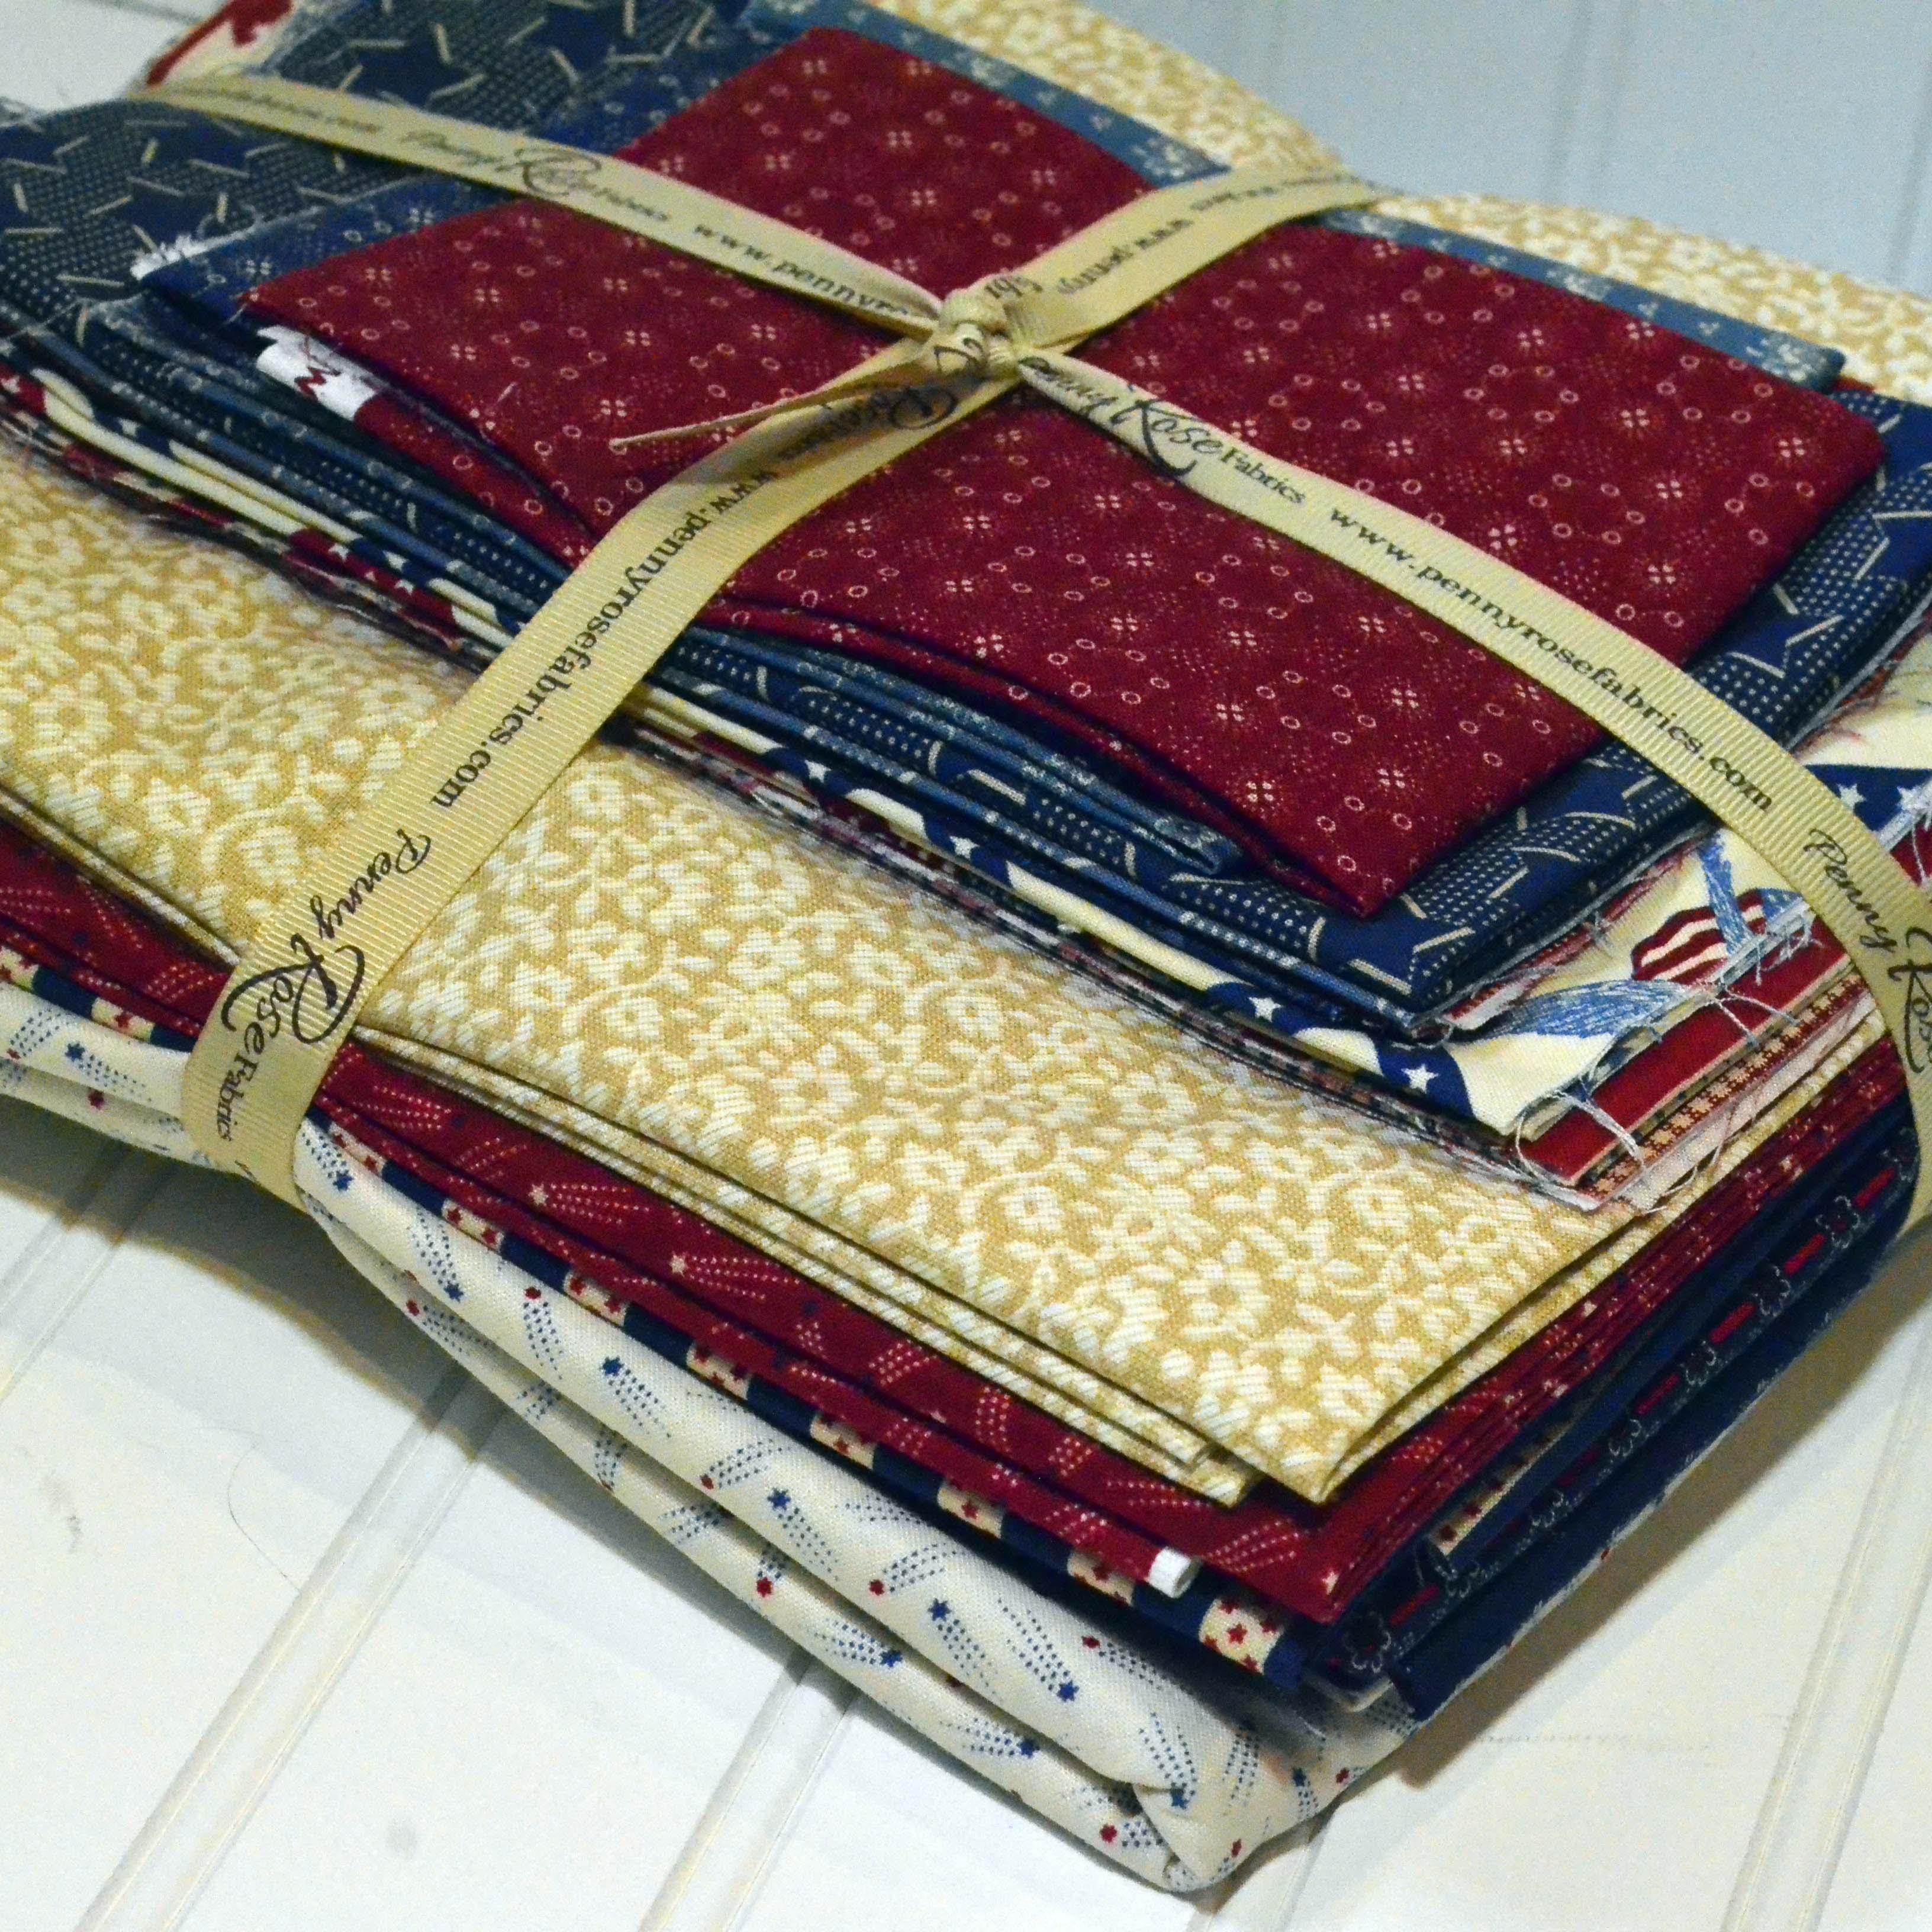 American Summer Patriotic Quilt Kit : patriotic quilt kits - Adamdwight.com